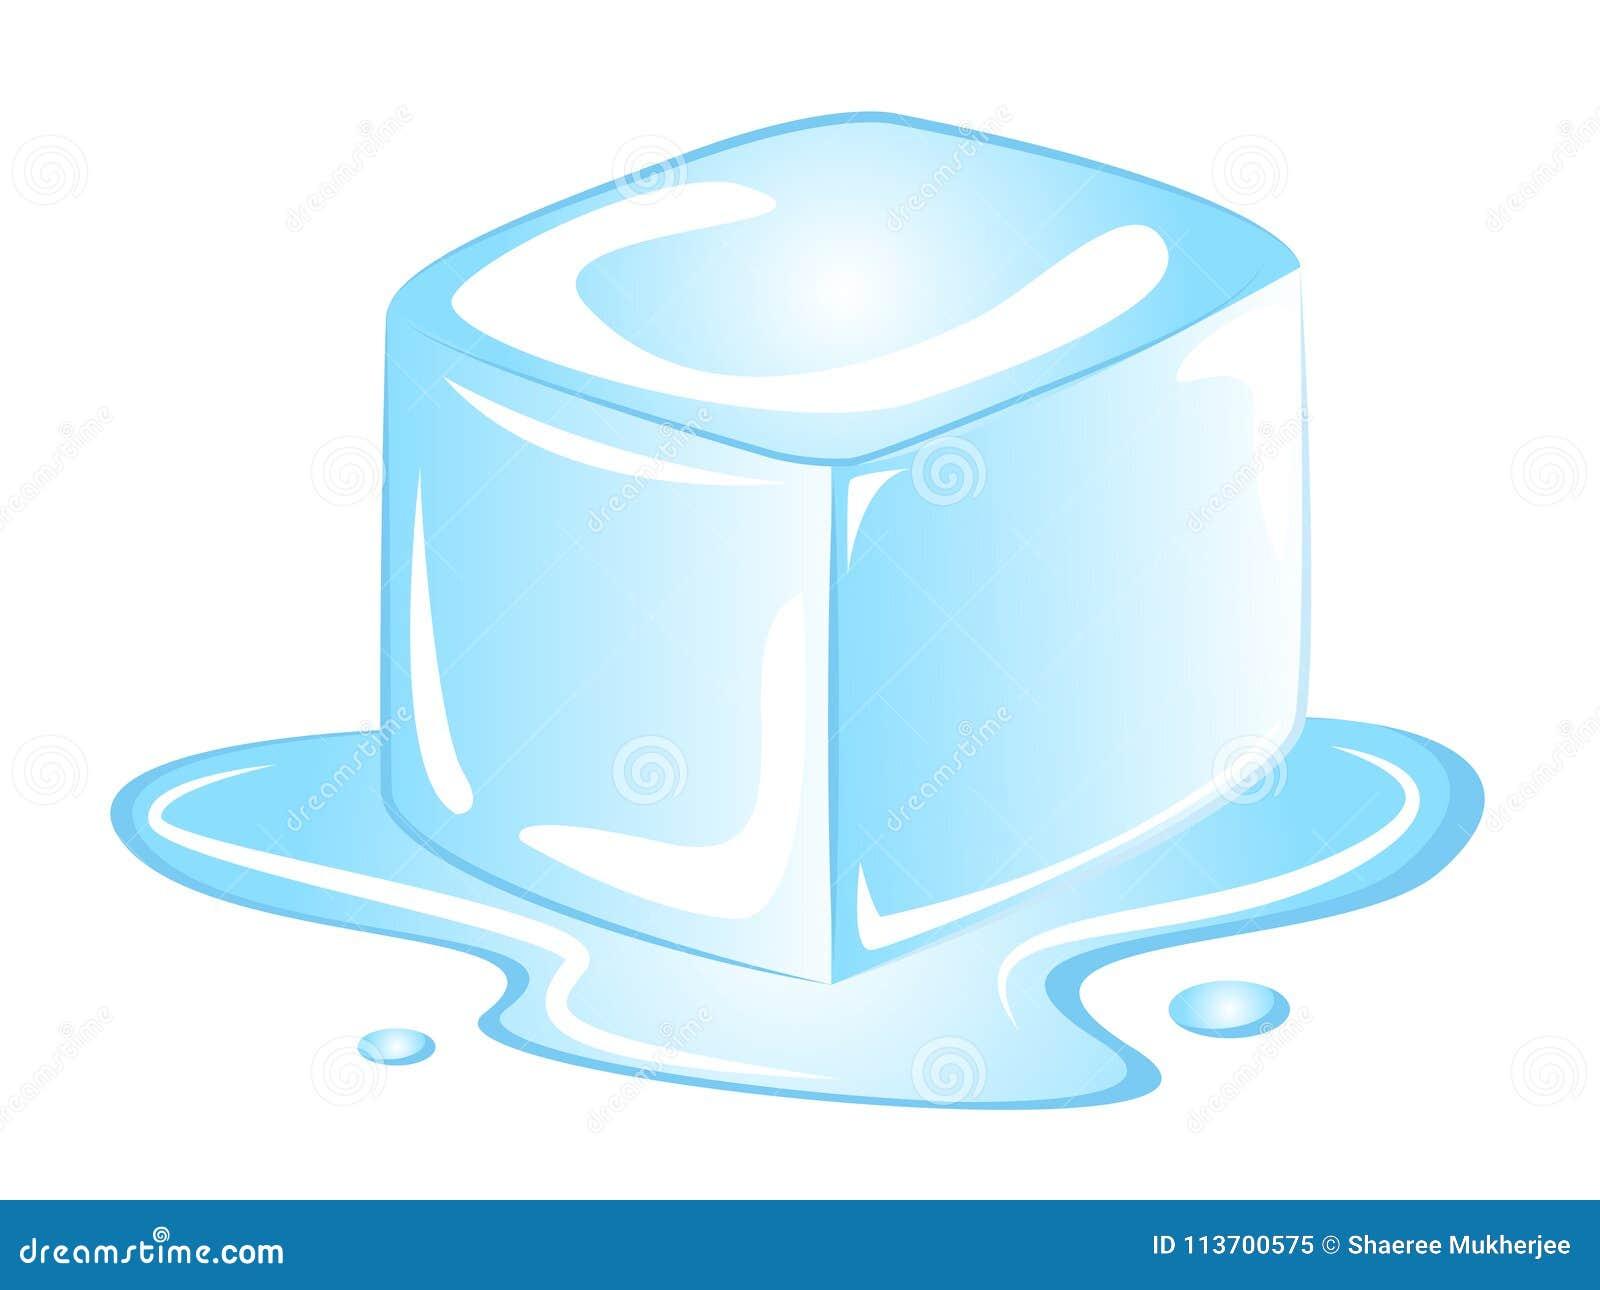 Cubo De Gelo Dos Desenhos Animados Do Vetor Ilustracao Do Vetor